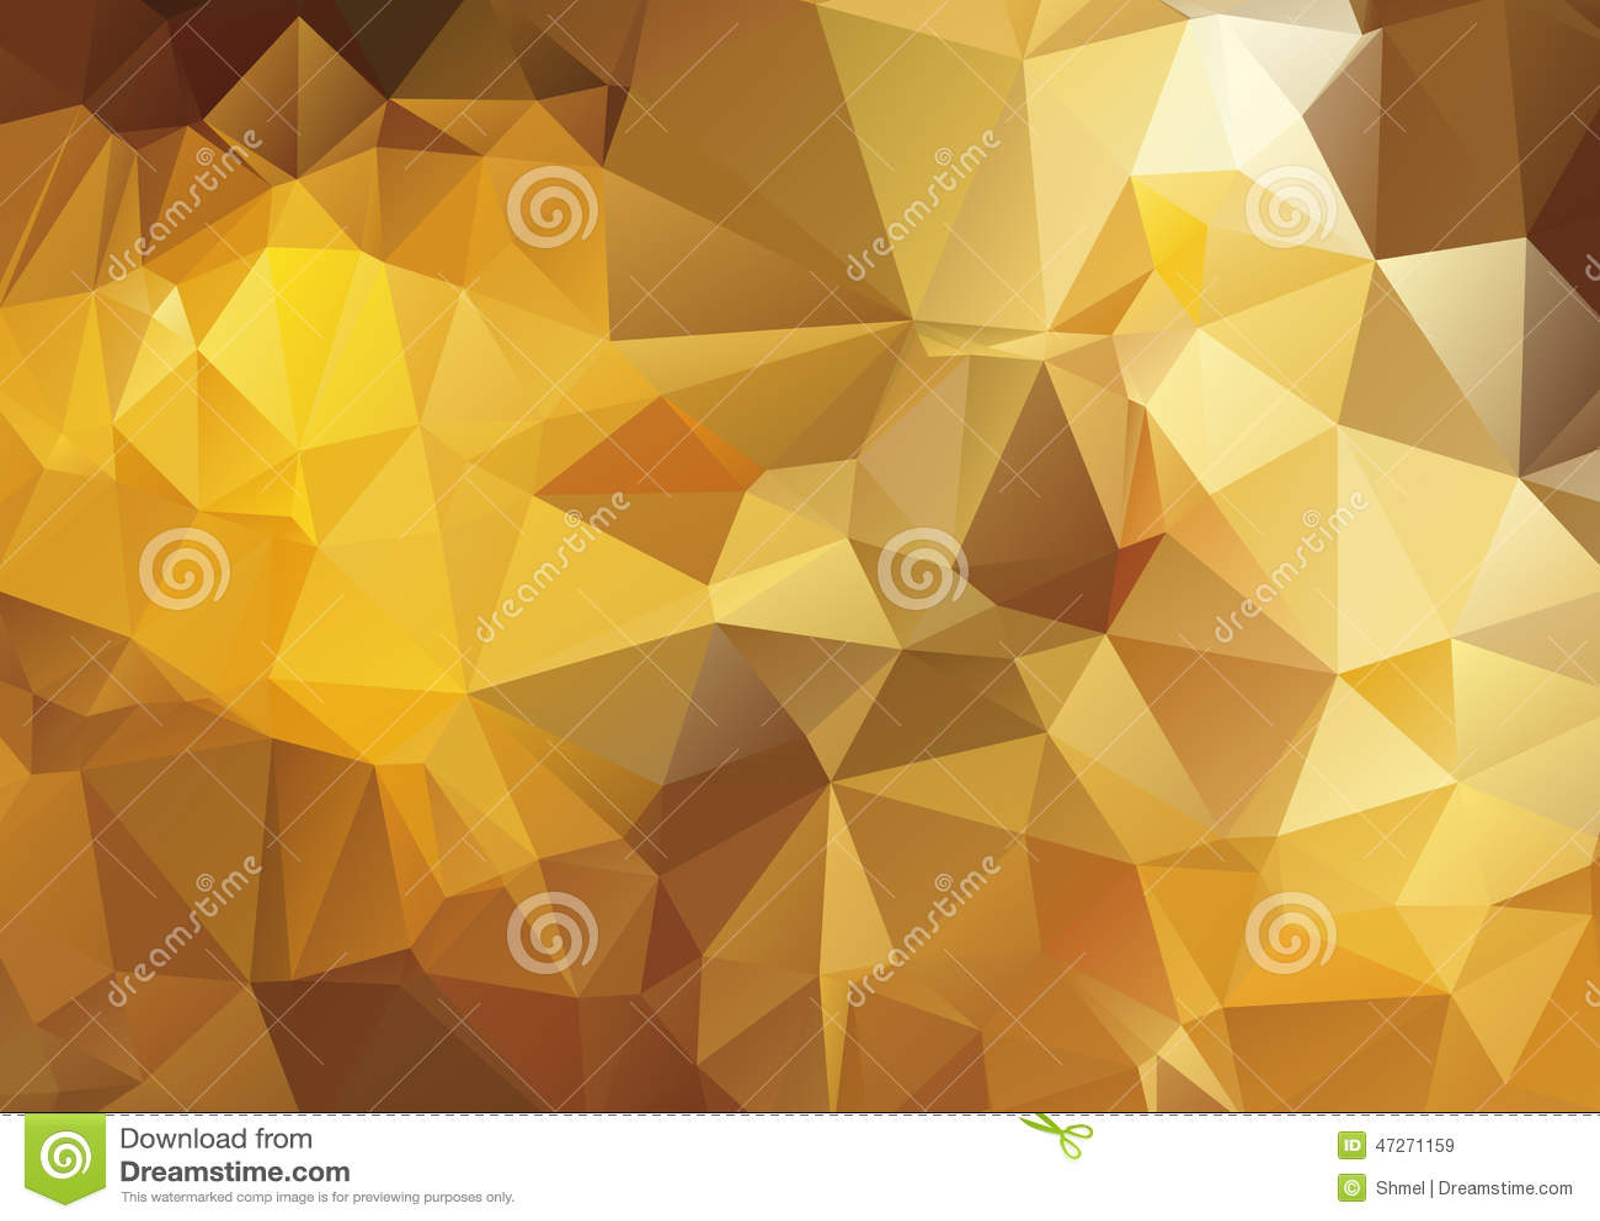 dark yellow abstract polygonal background stock